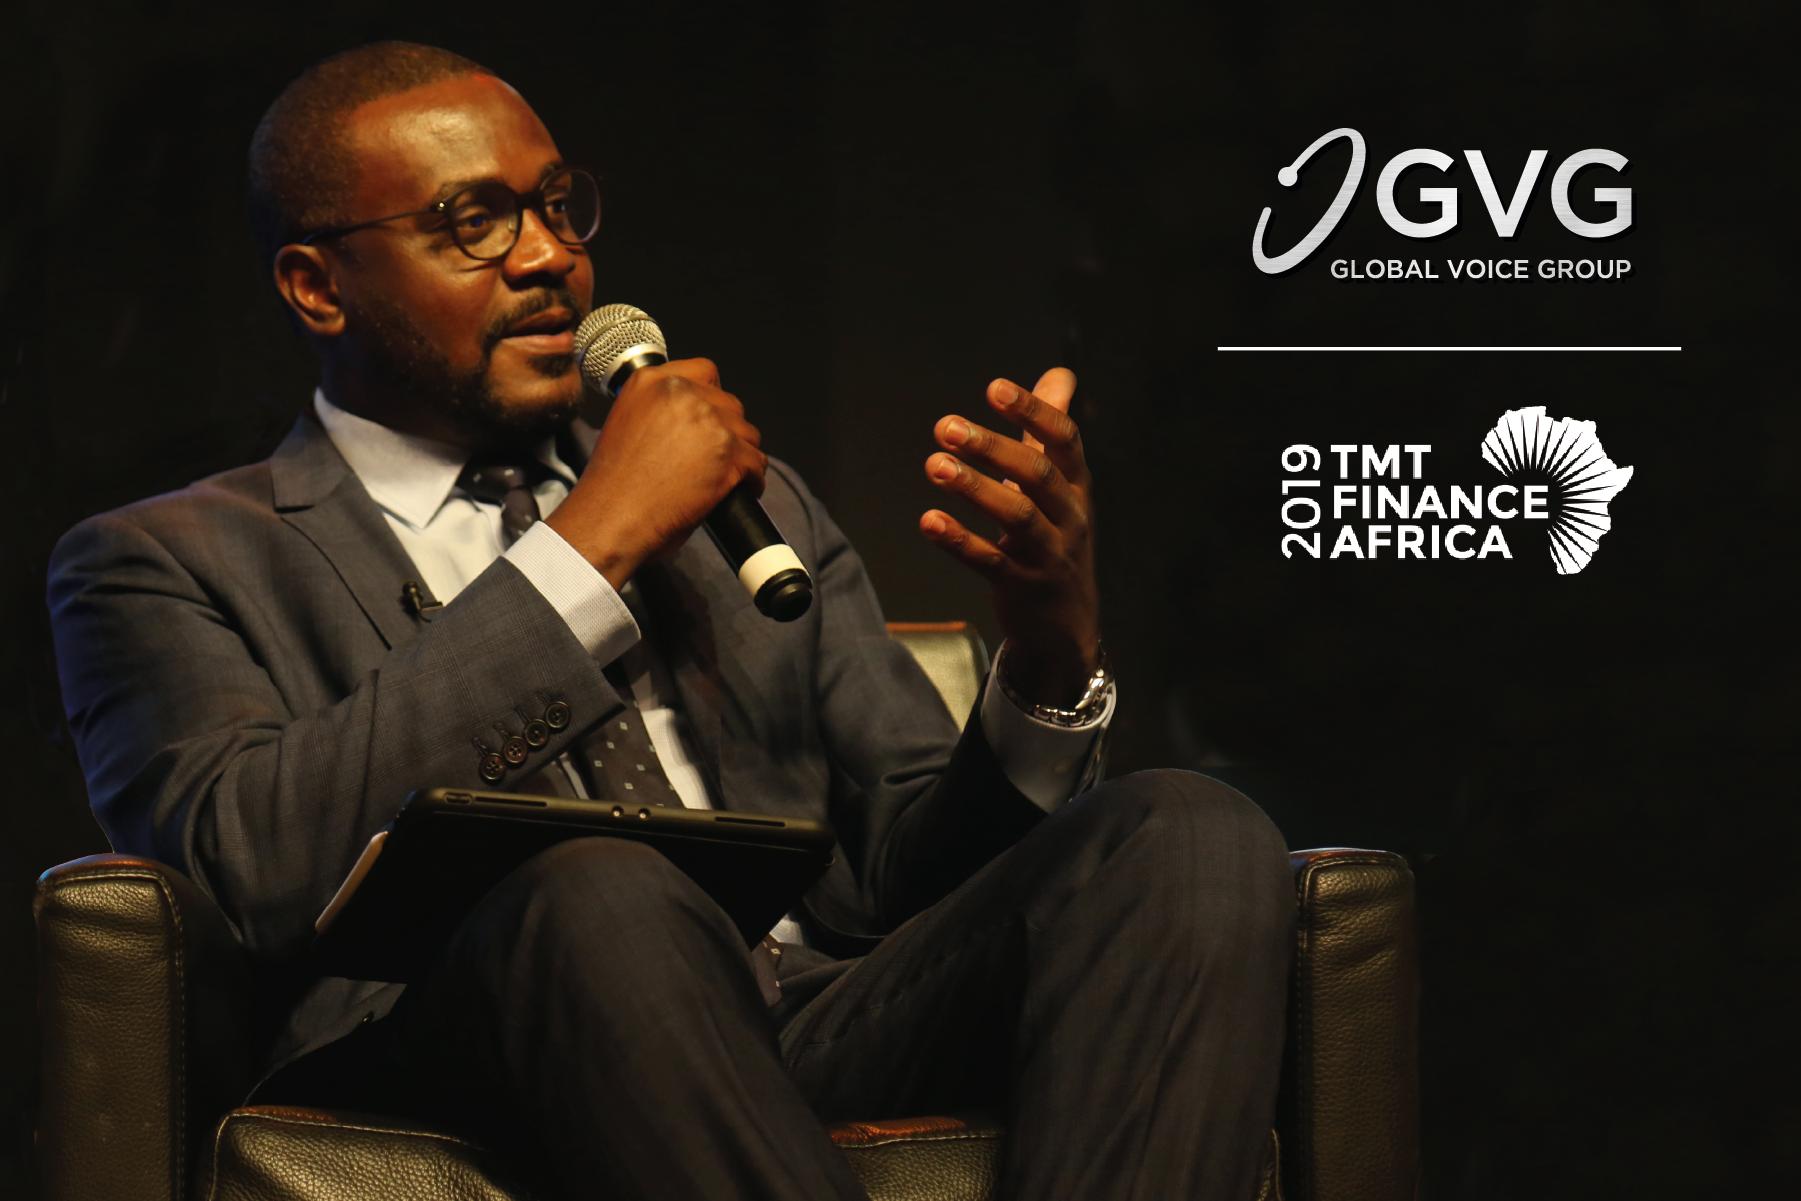 GVG Participates In TMT Finance Africa 2019 World Congress